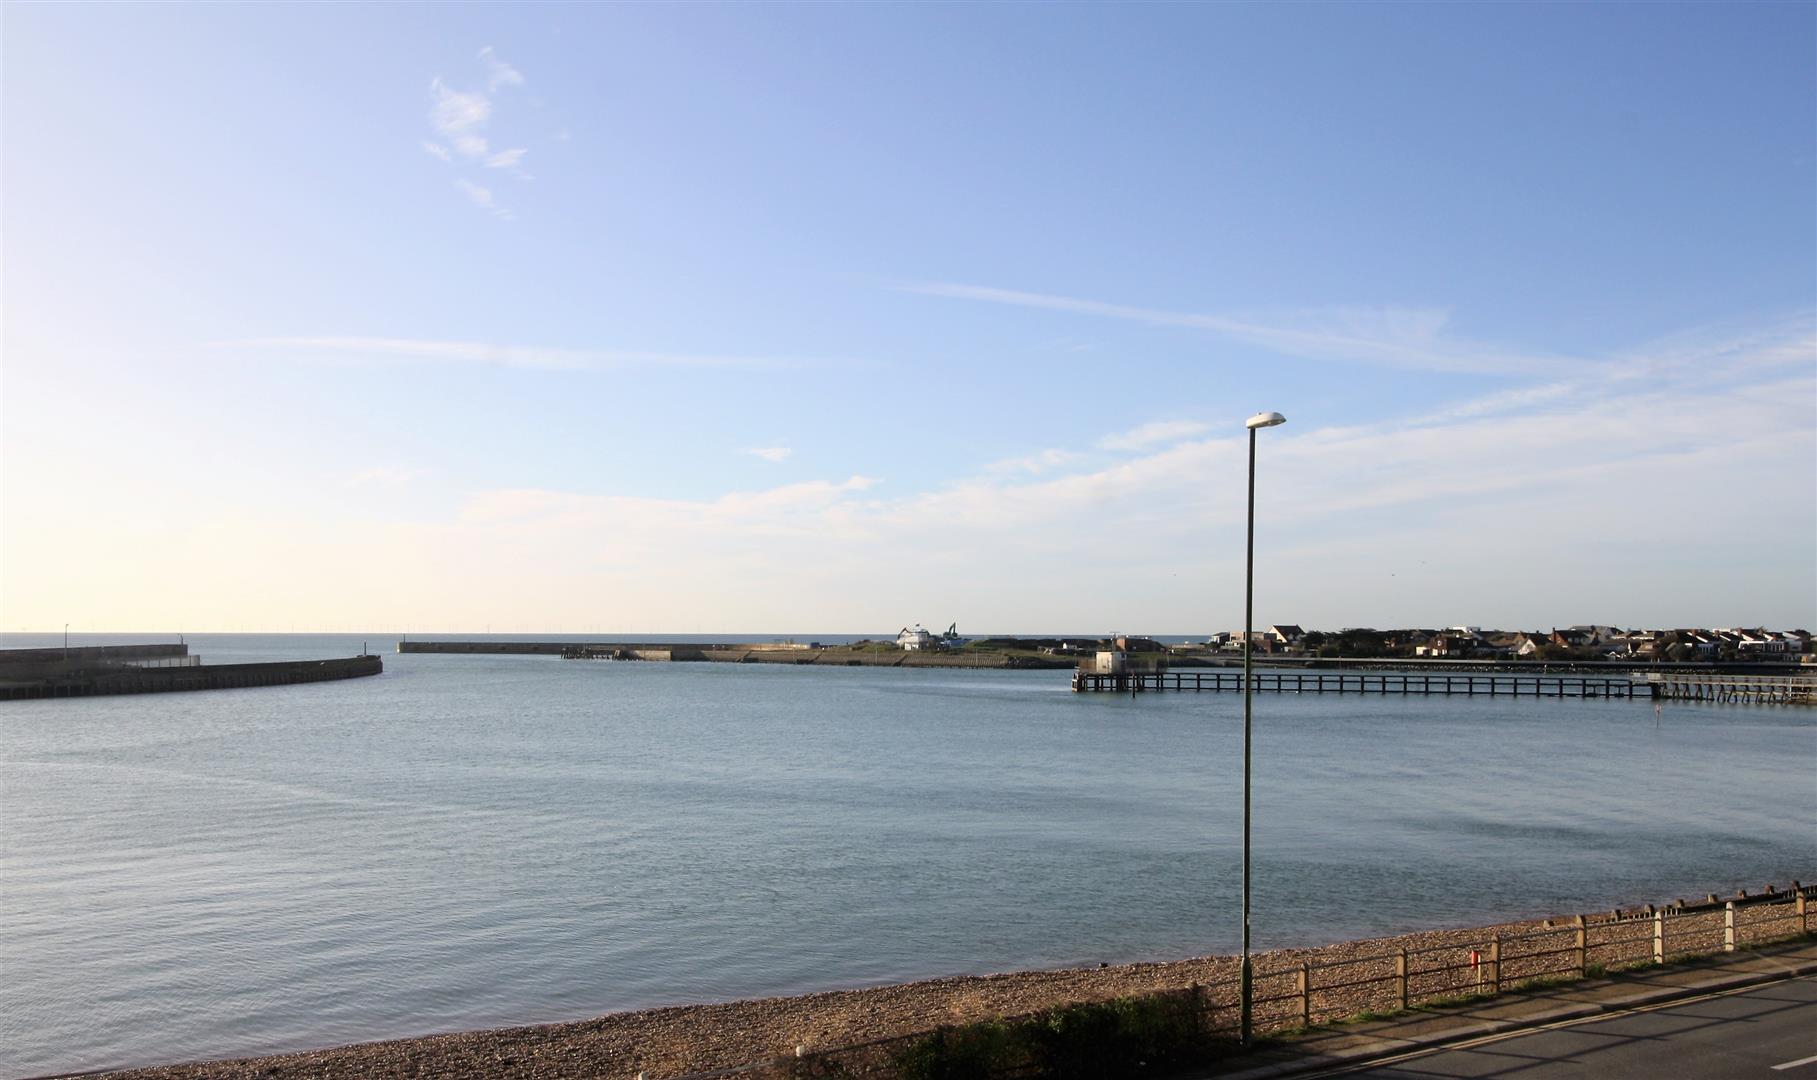 Kingston Lane, Shoreham-By-Sea